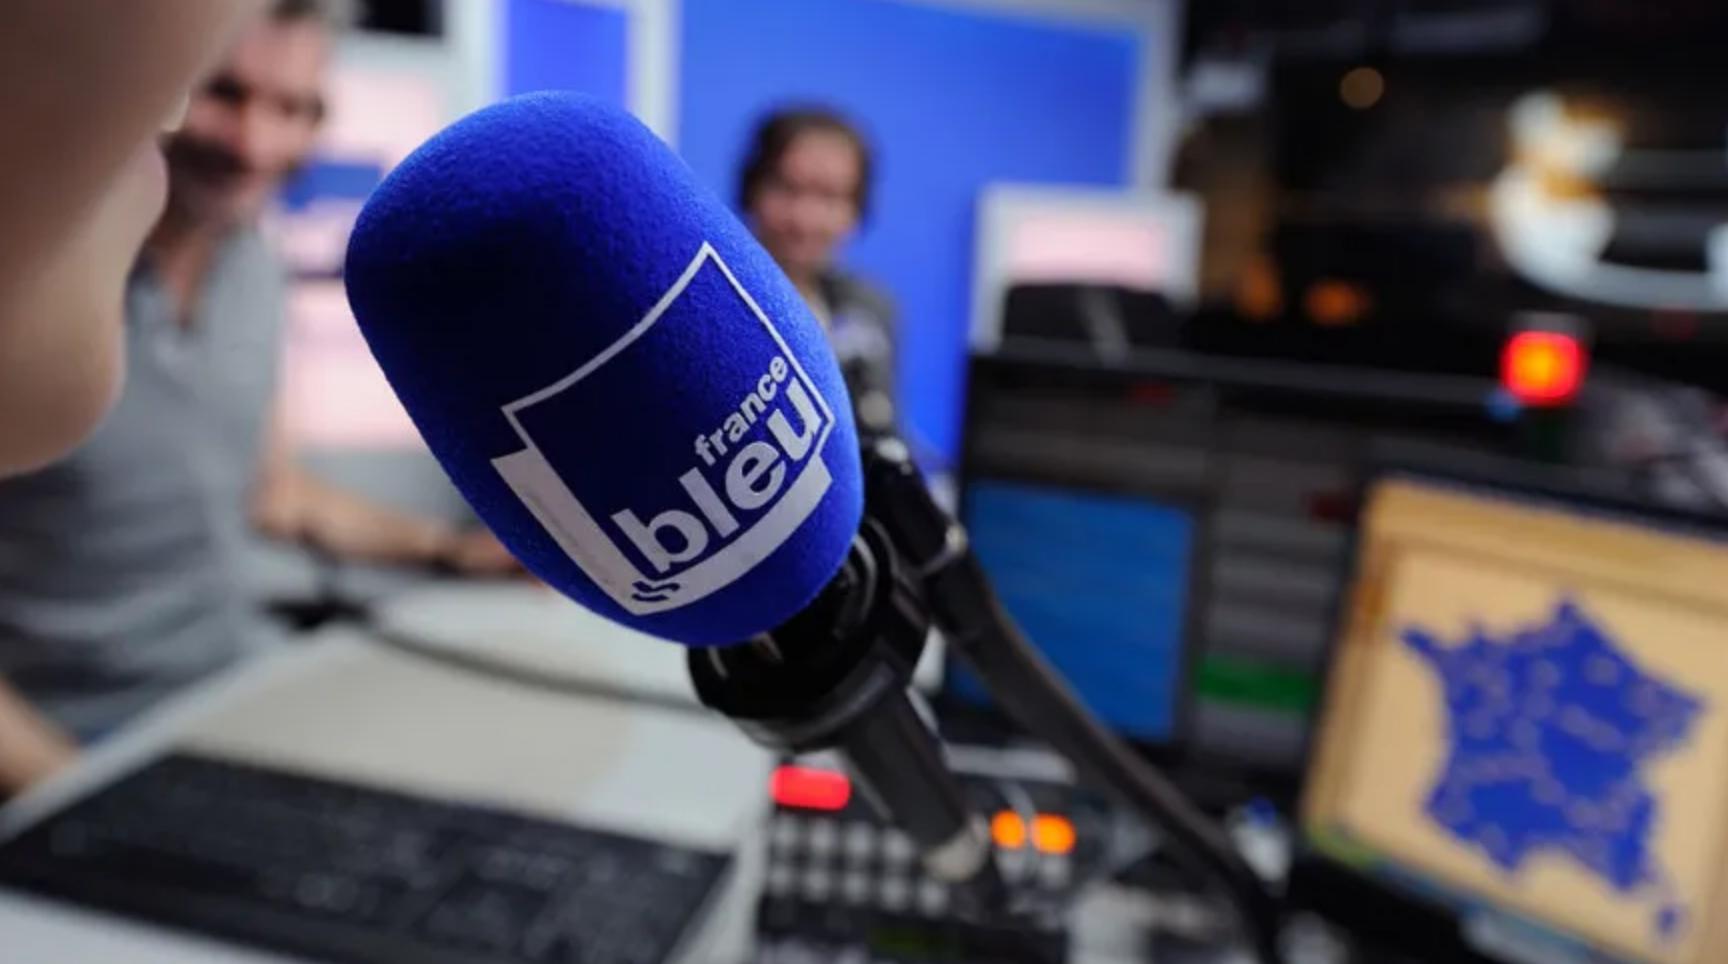 Municipales : France Bleu promet 10 000 éditions d'informations locales